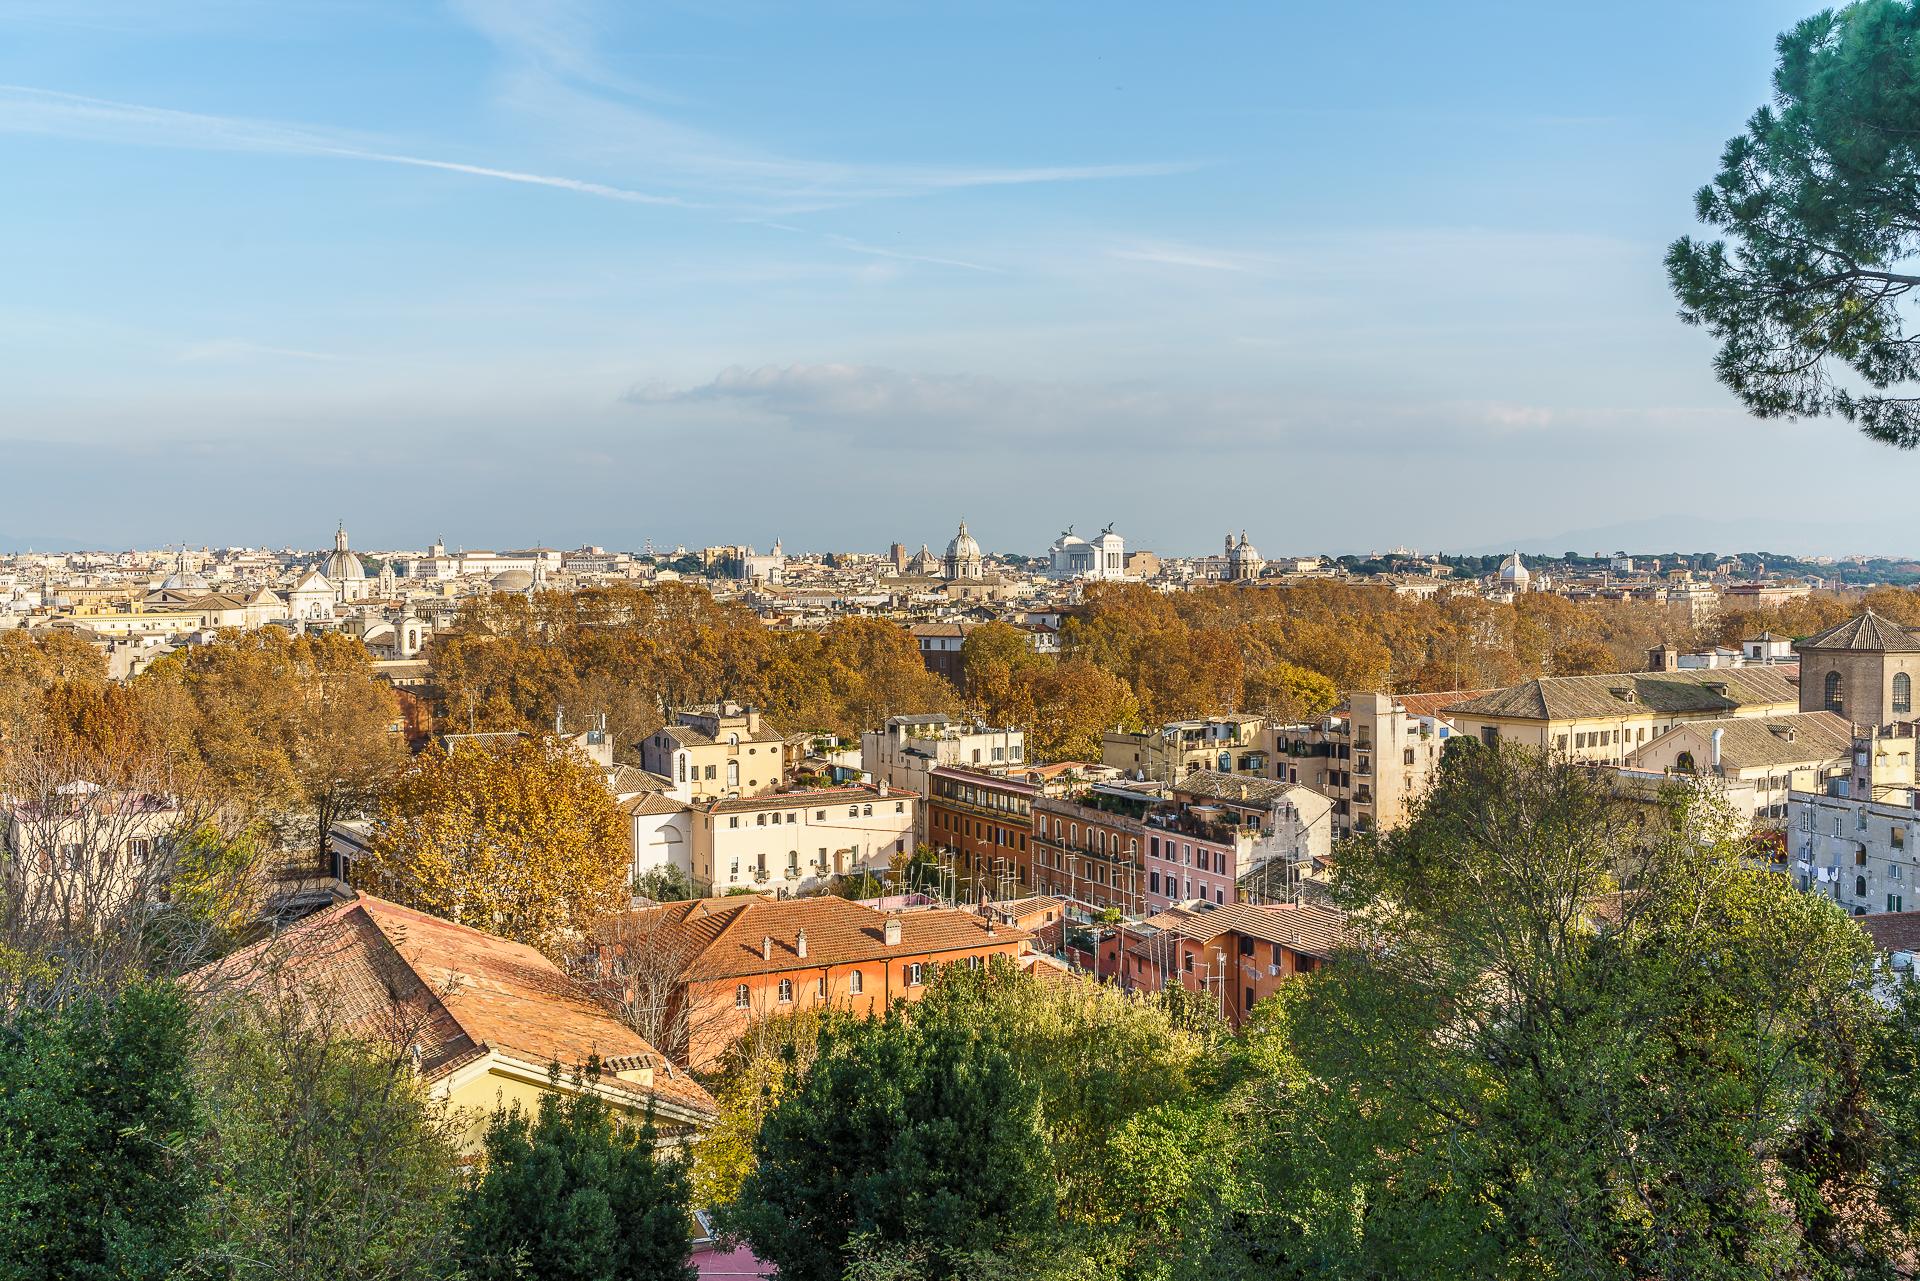 Rom-Piazza-Guiseppe-Garibaldi